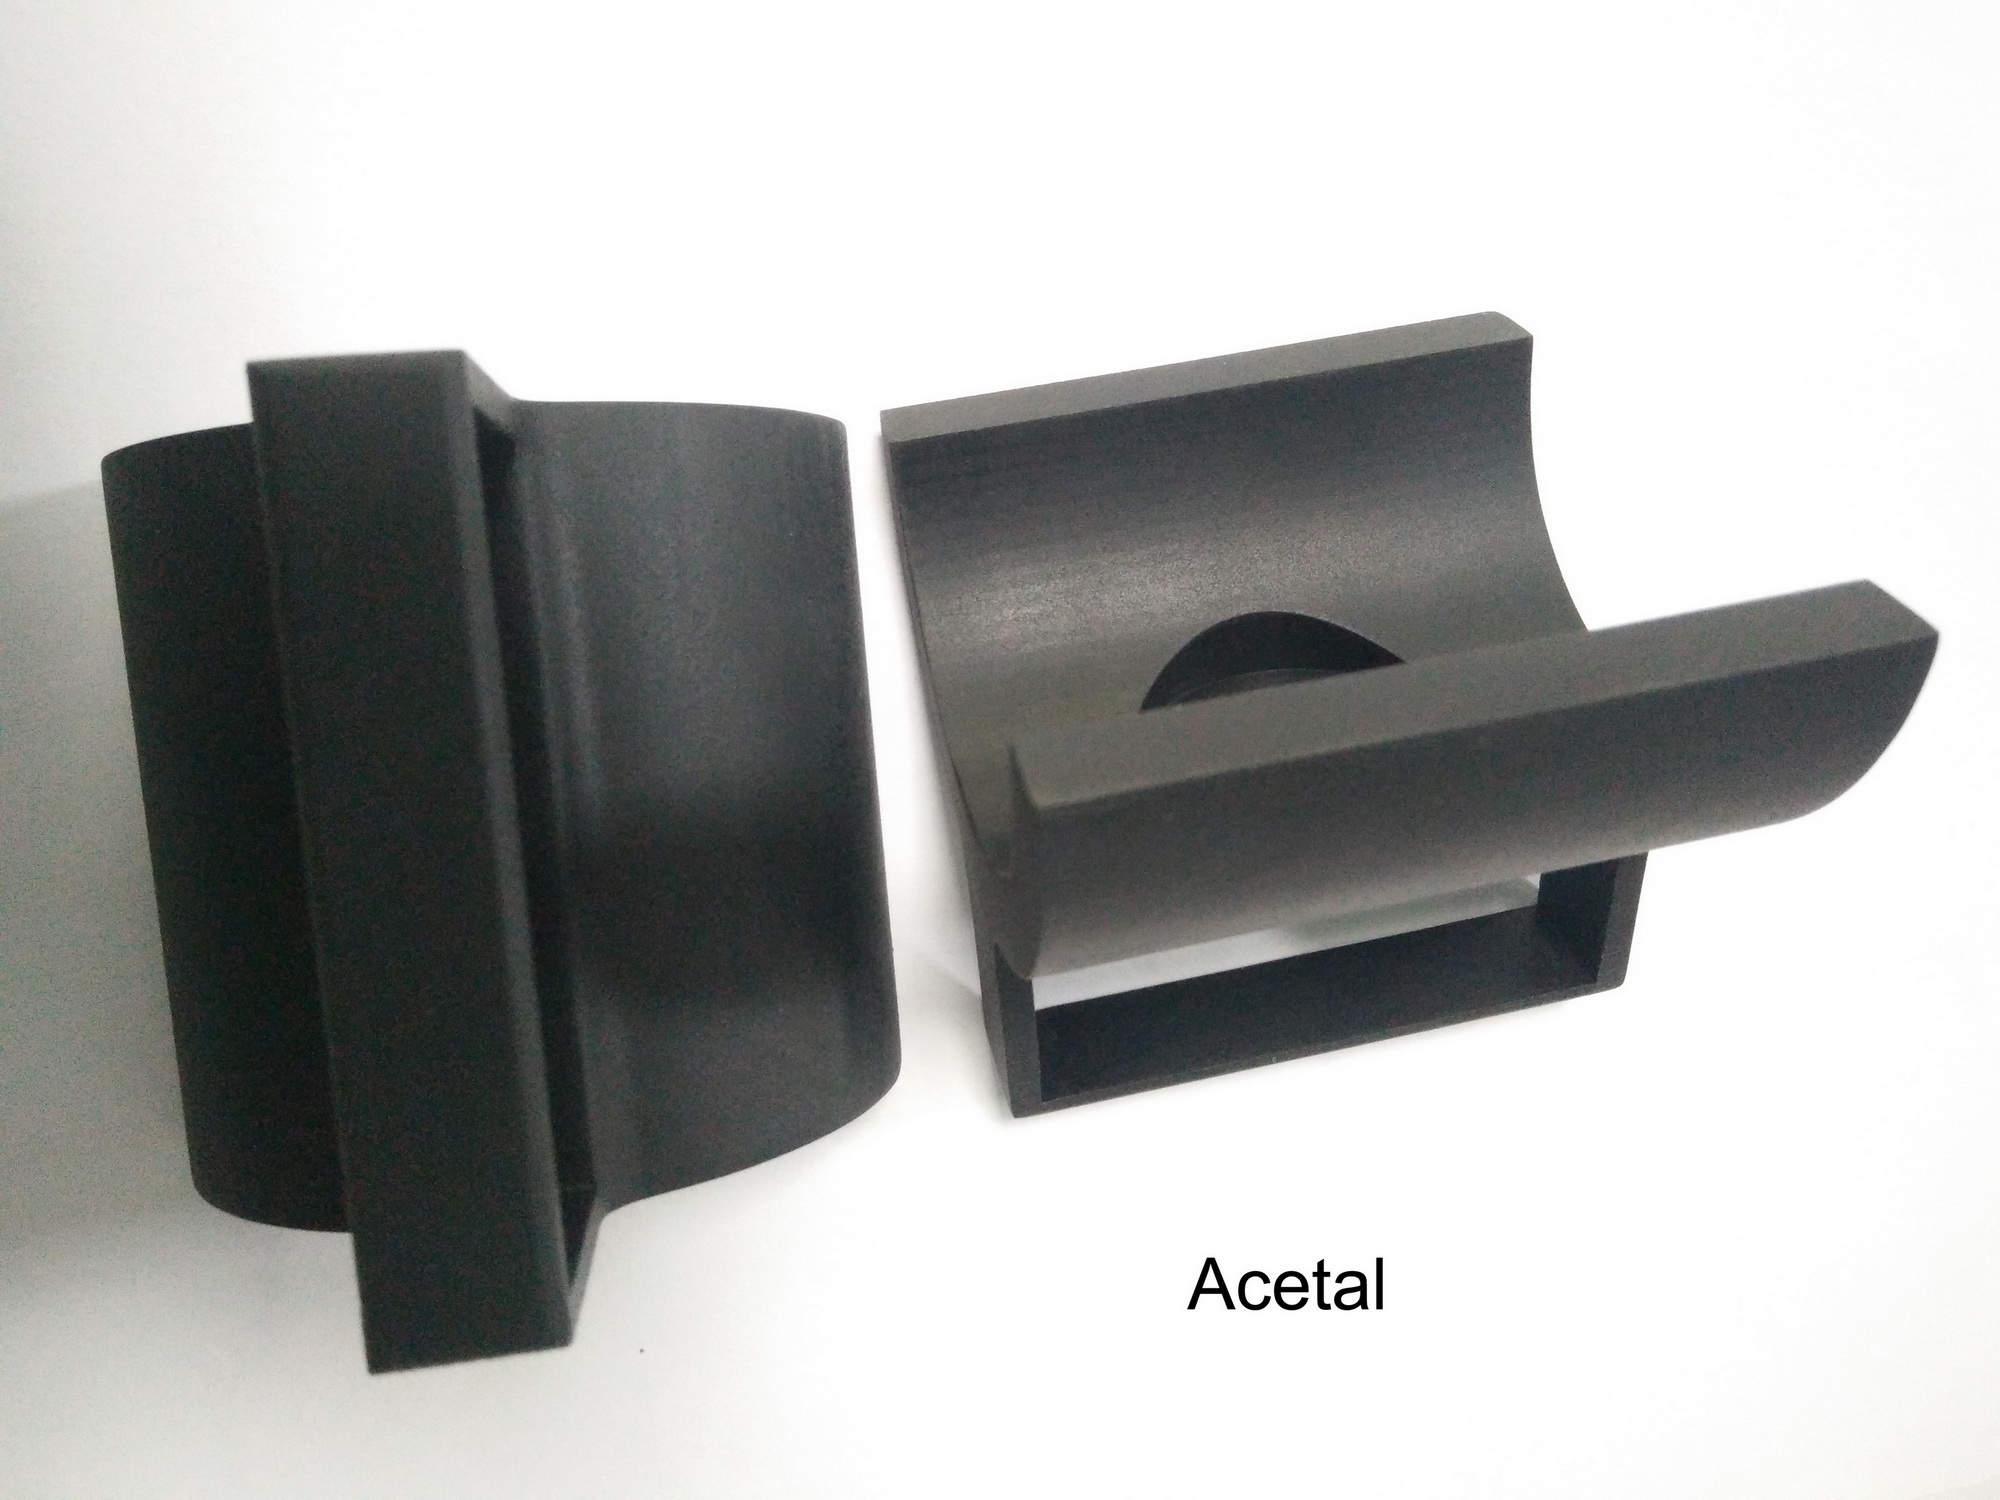 Acetal